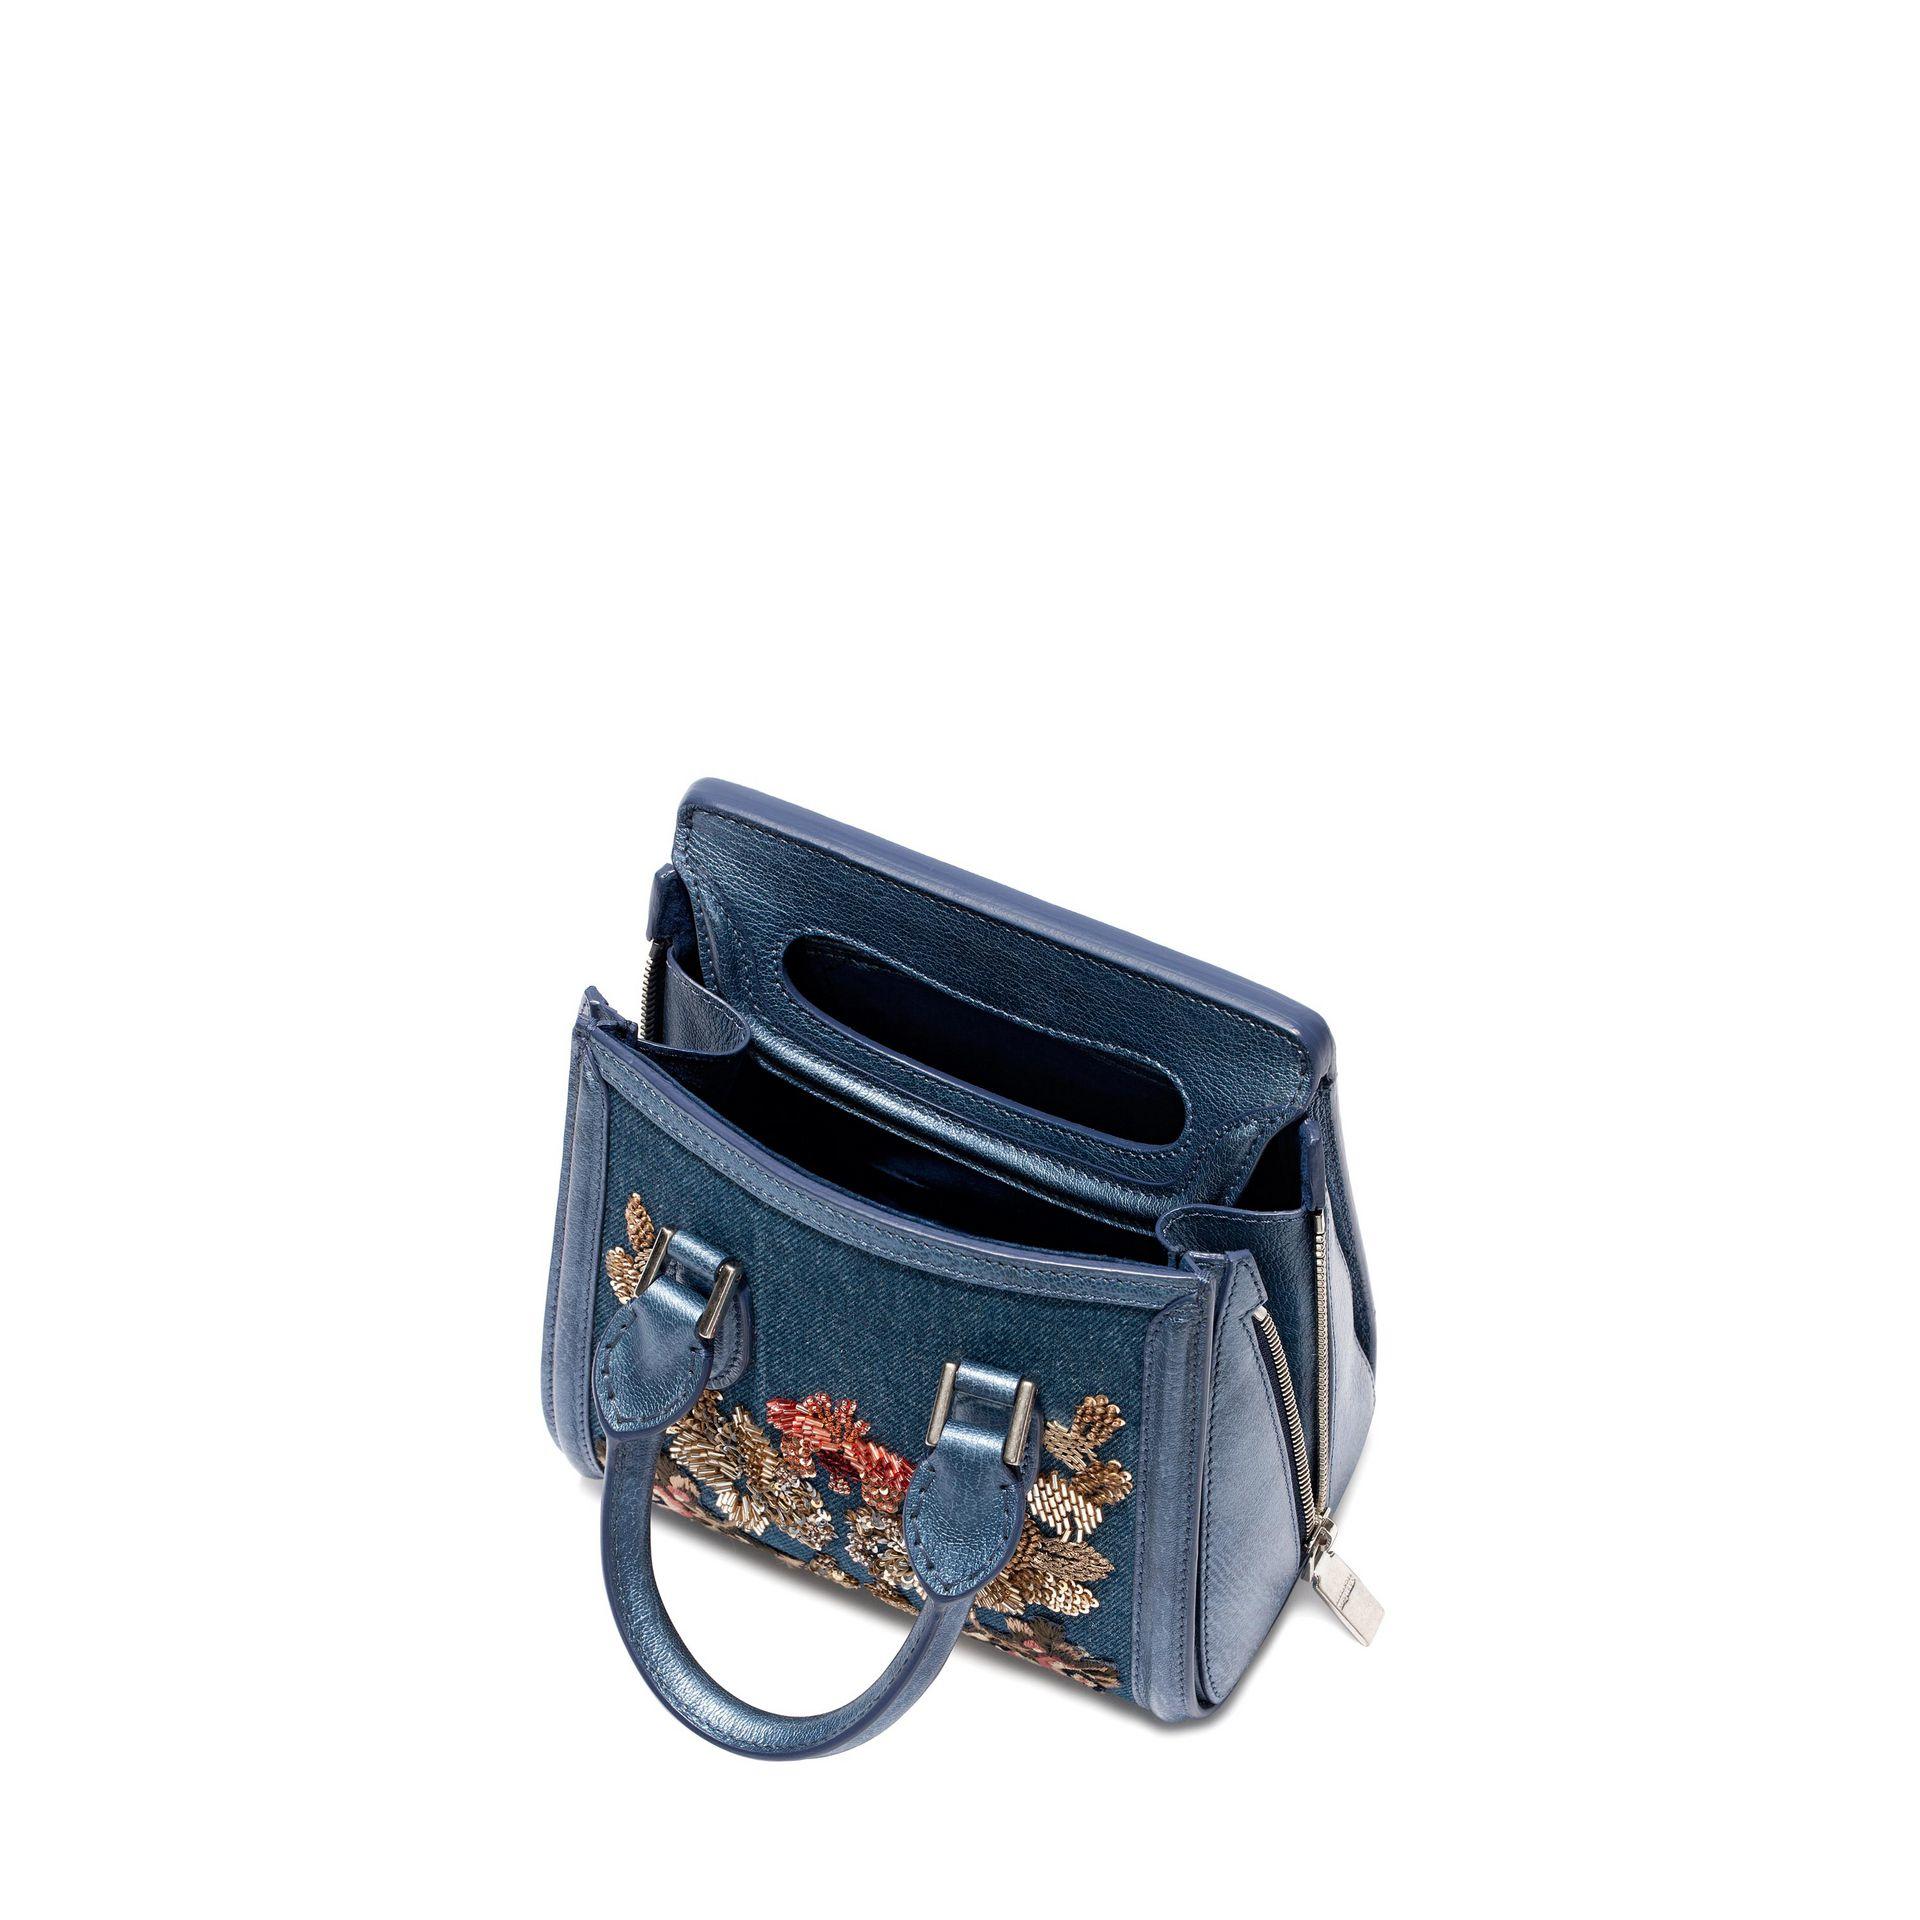 4974698dfd Alexander Mcqueen Washed Denim Embroidered Mini Heroine in Blue - Lyst